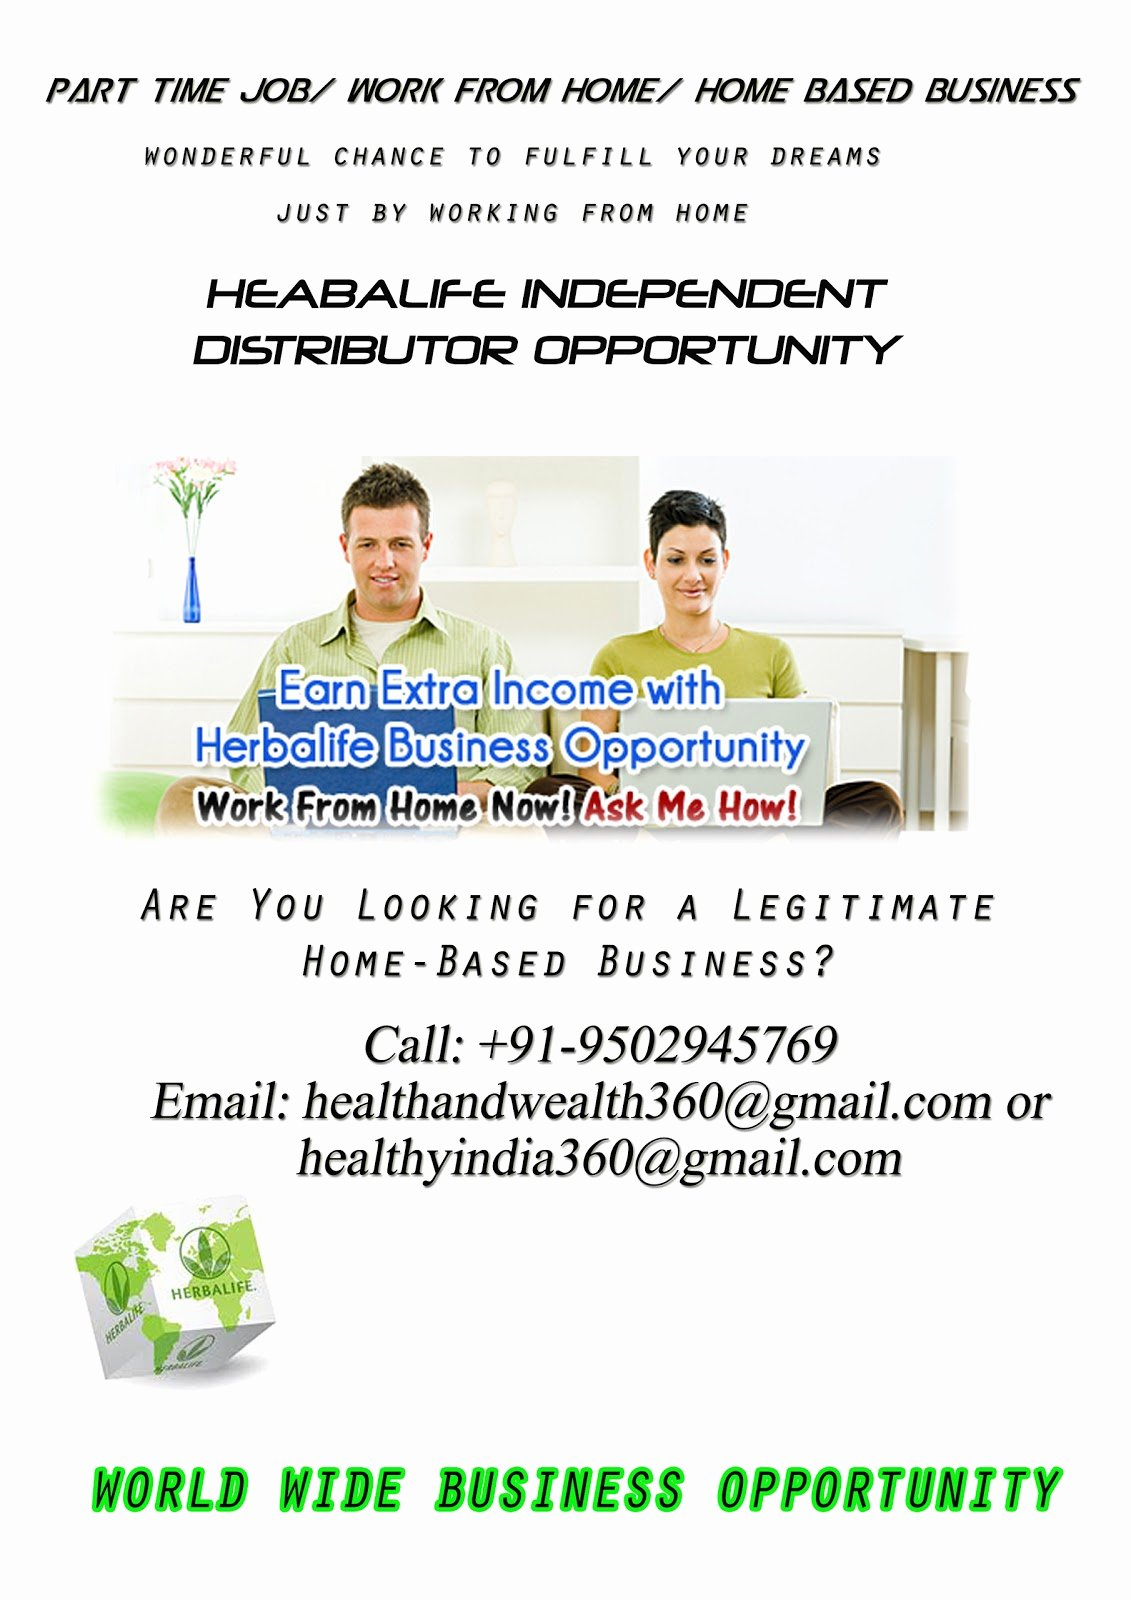 Herbalife Flyers Template Best Of Herbalife Business Opportunity Herbalife Flyer